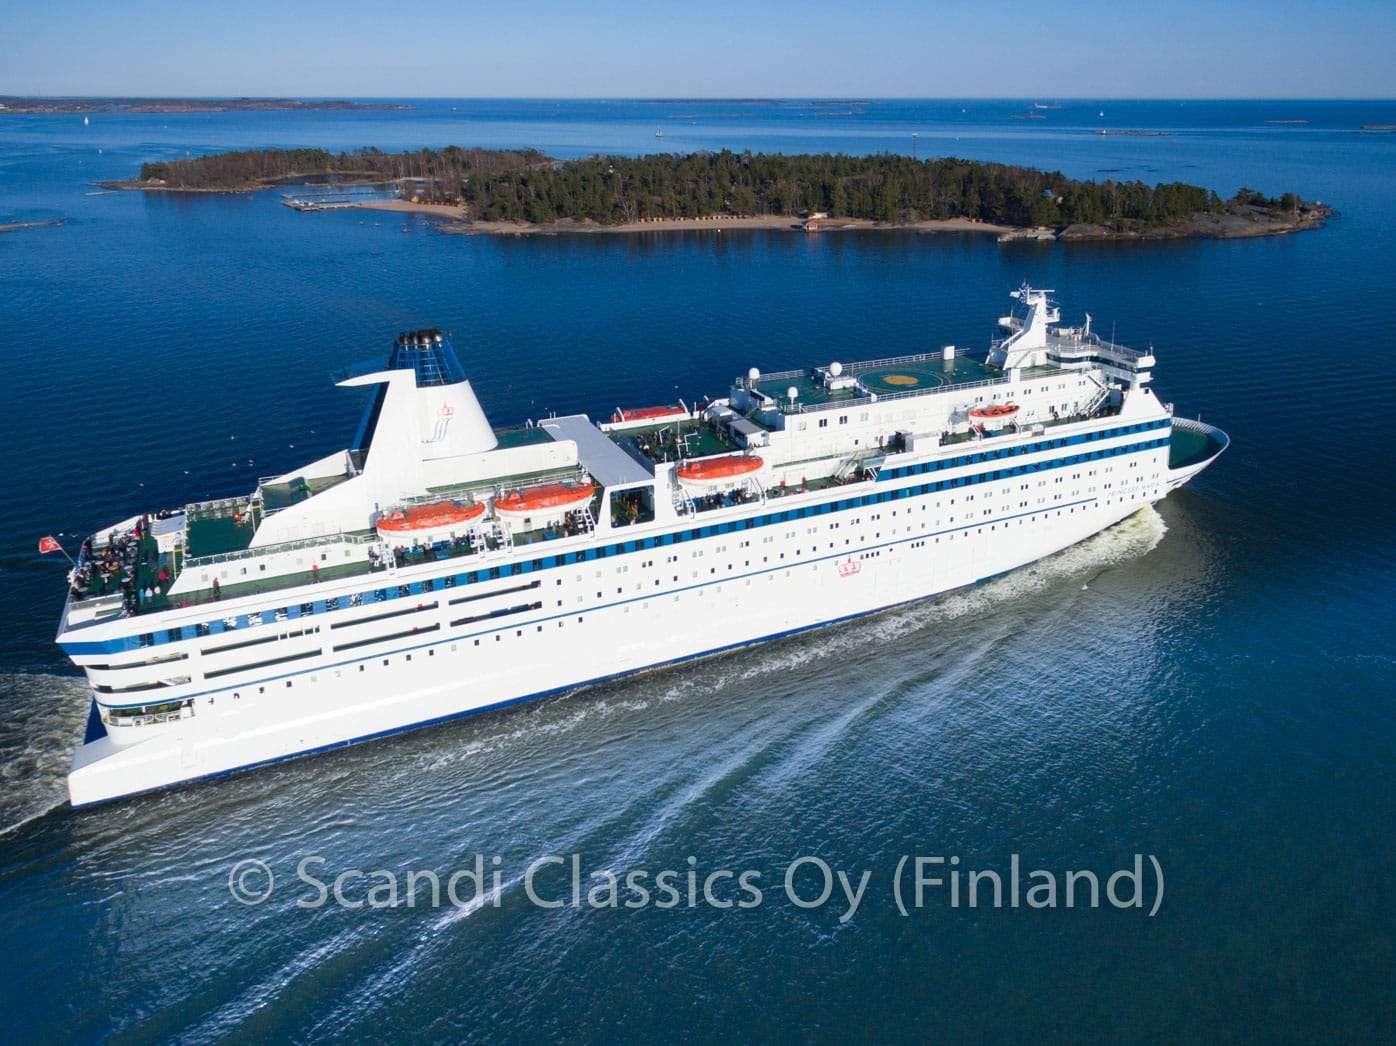 Helsinki To St Petersburg Cruise Russia Visa Free Travel - St petersburg tours for cruise ship passengers